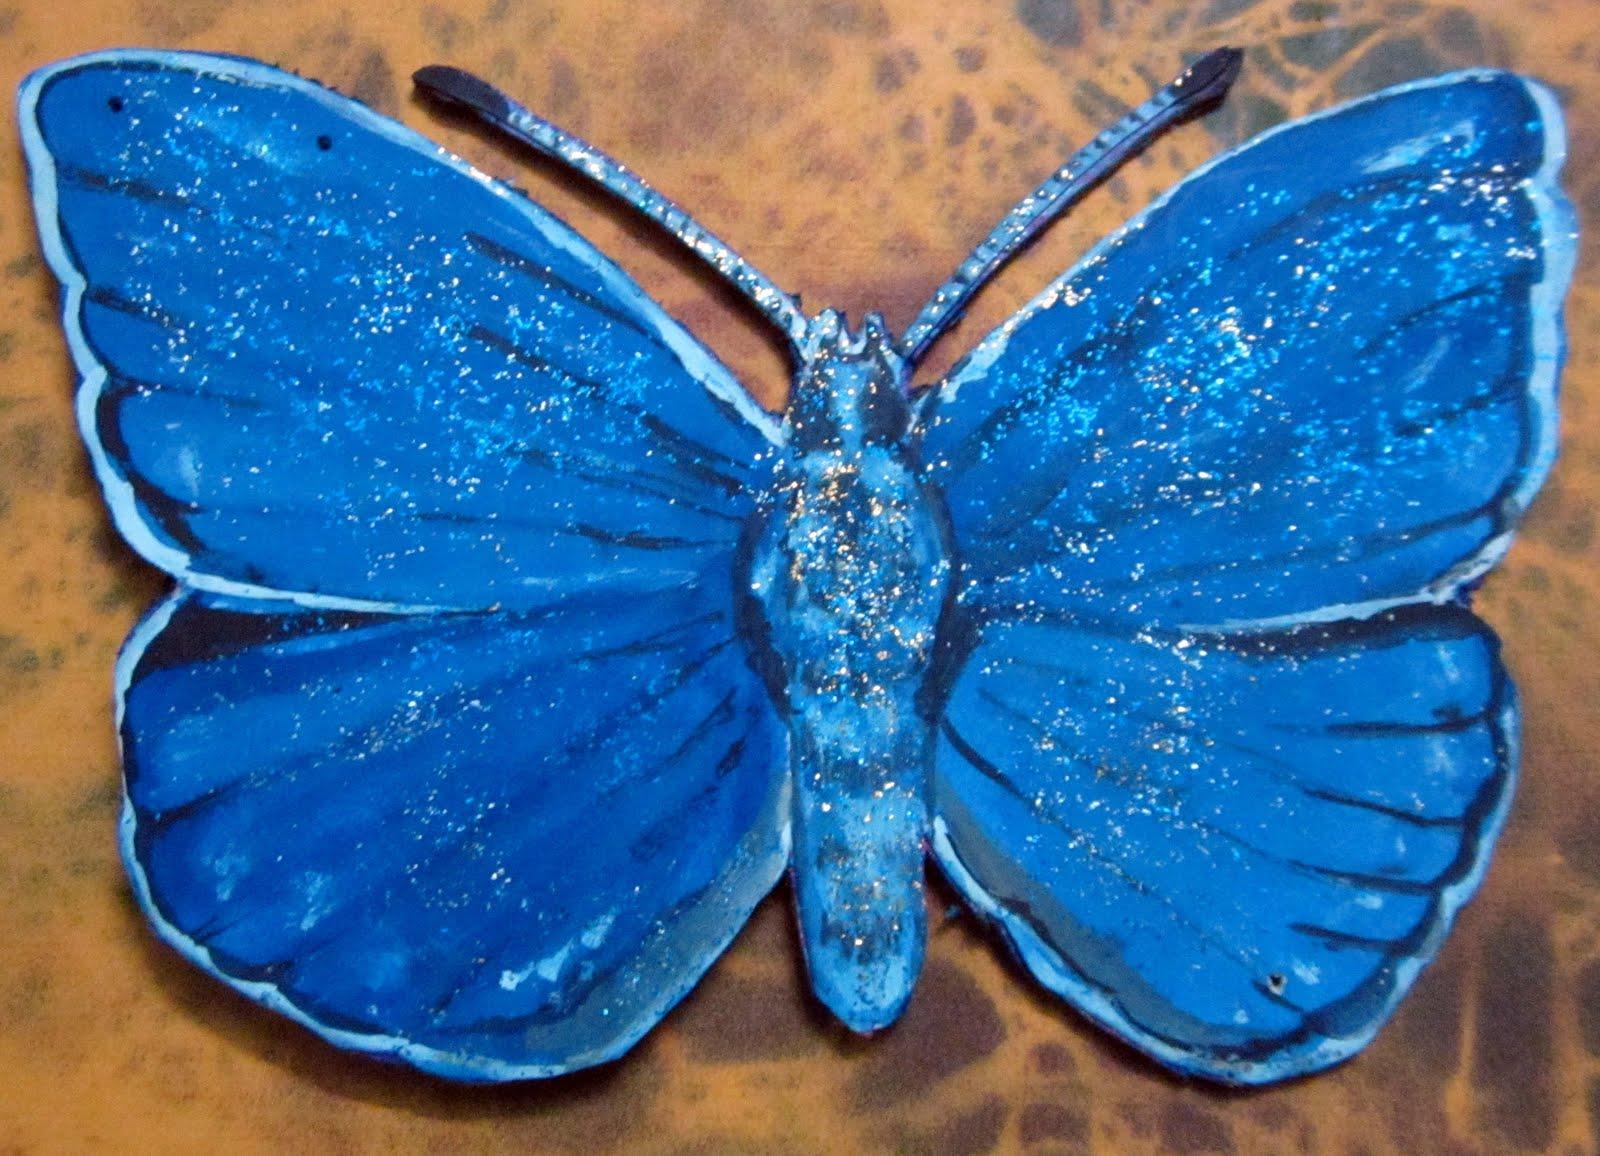 The Blue Things The Bluethings The Bluethings Story Volume Two